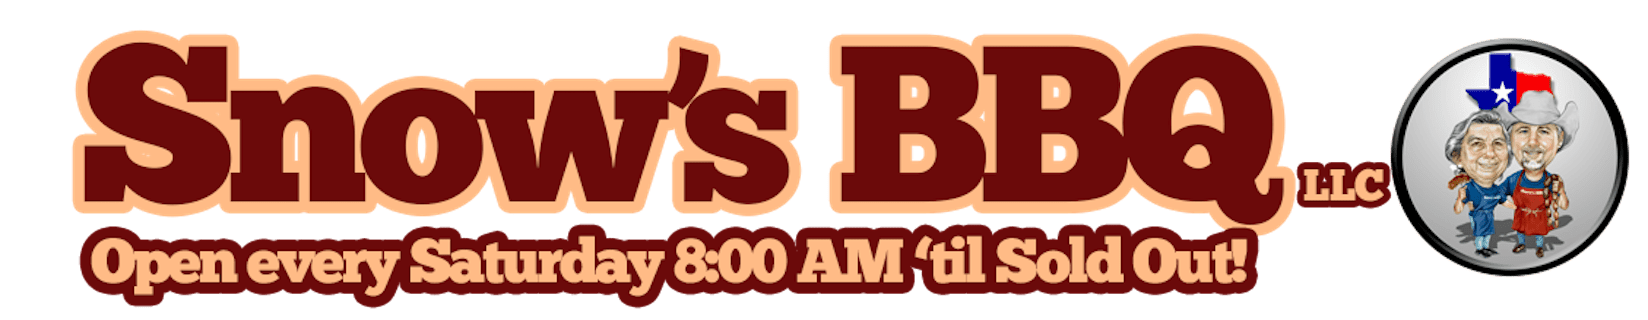 Snow's BBQ LLC